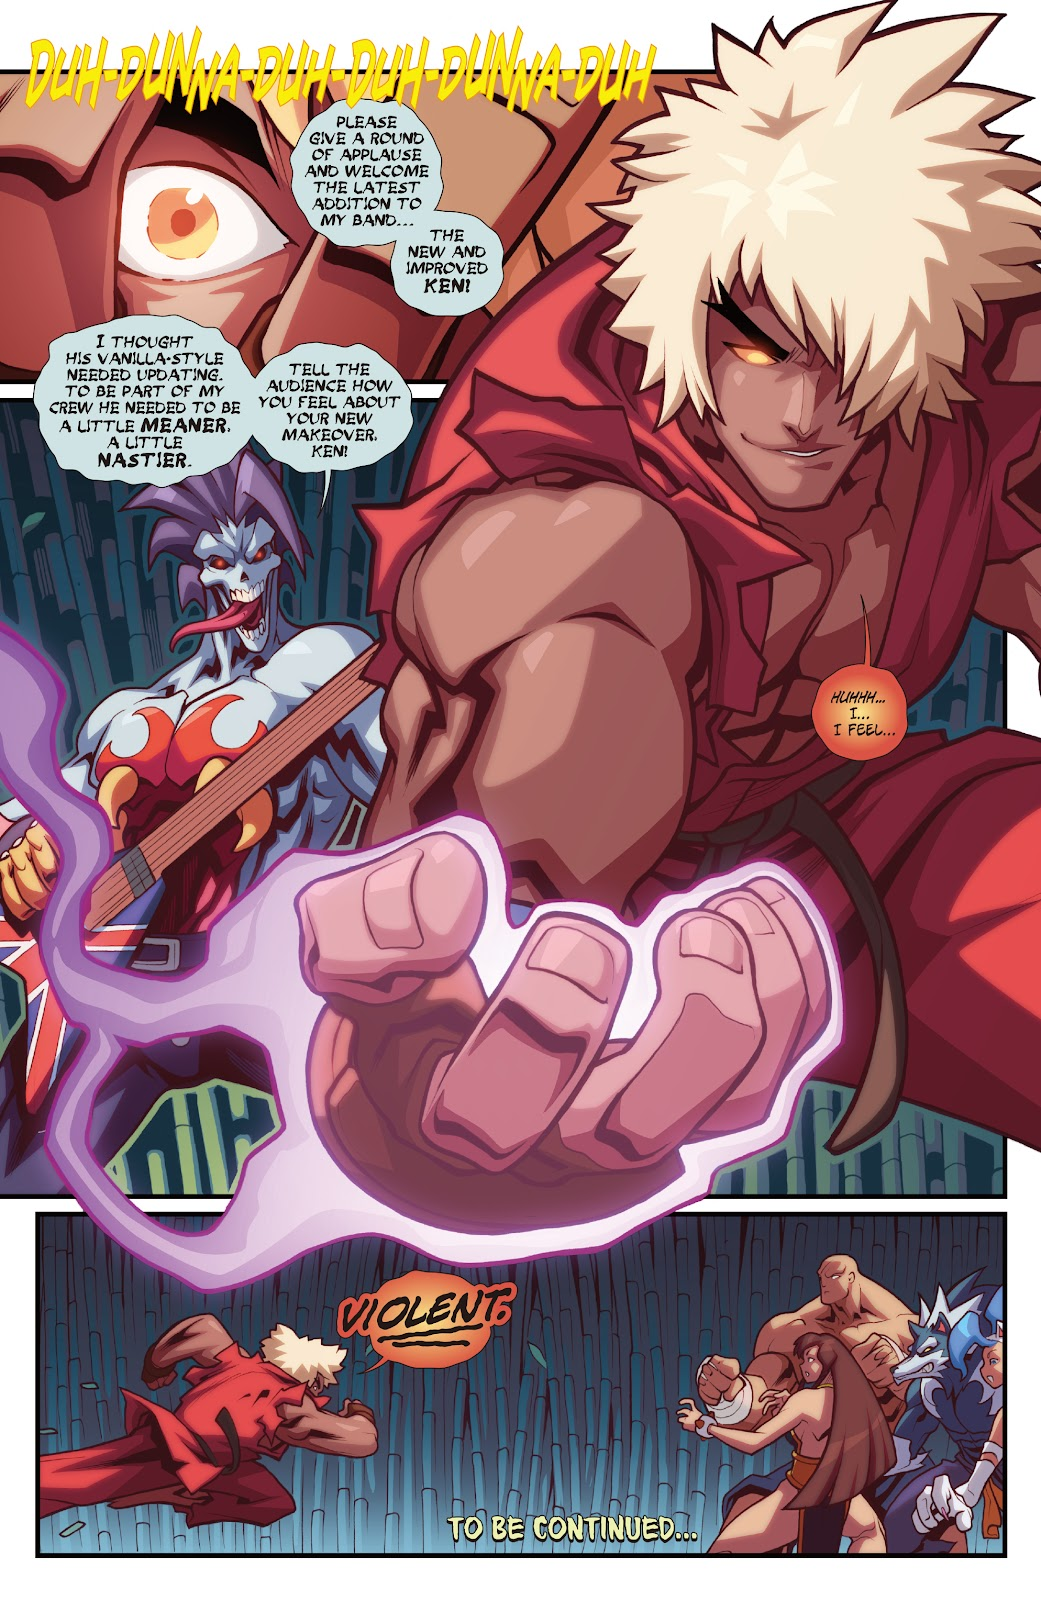 Street Fighter VS Darkstalkers Issue #2 #3 - English 20